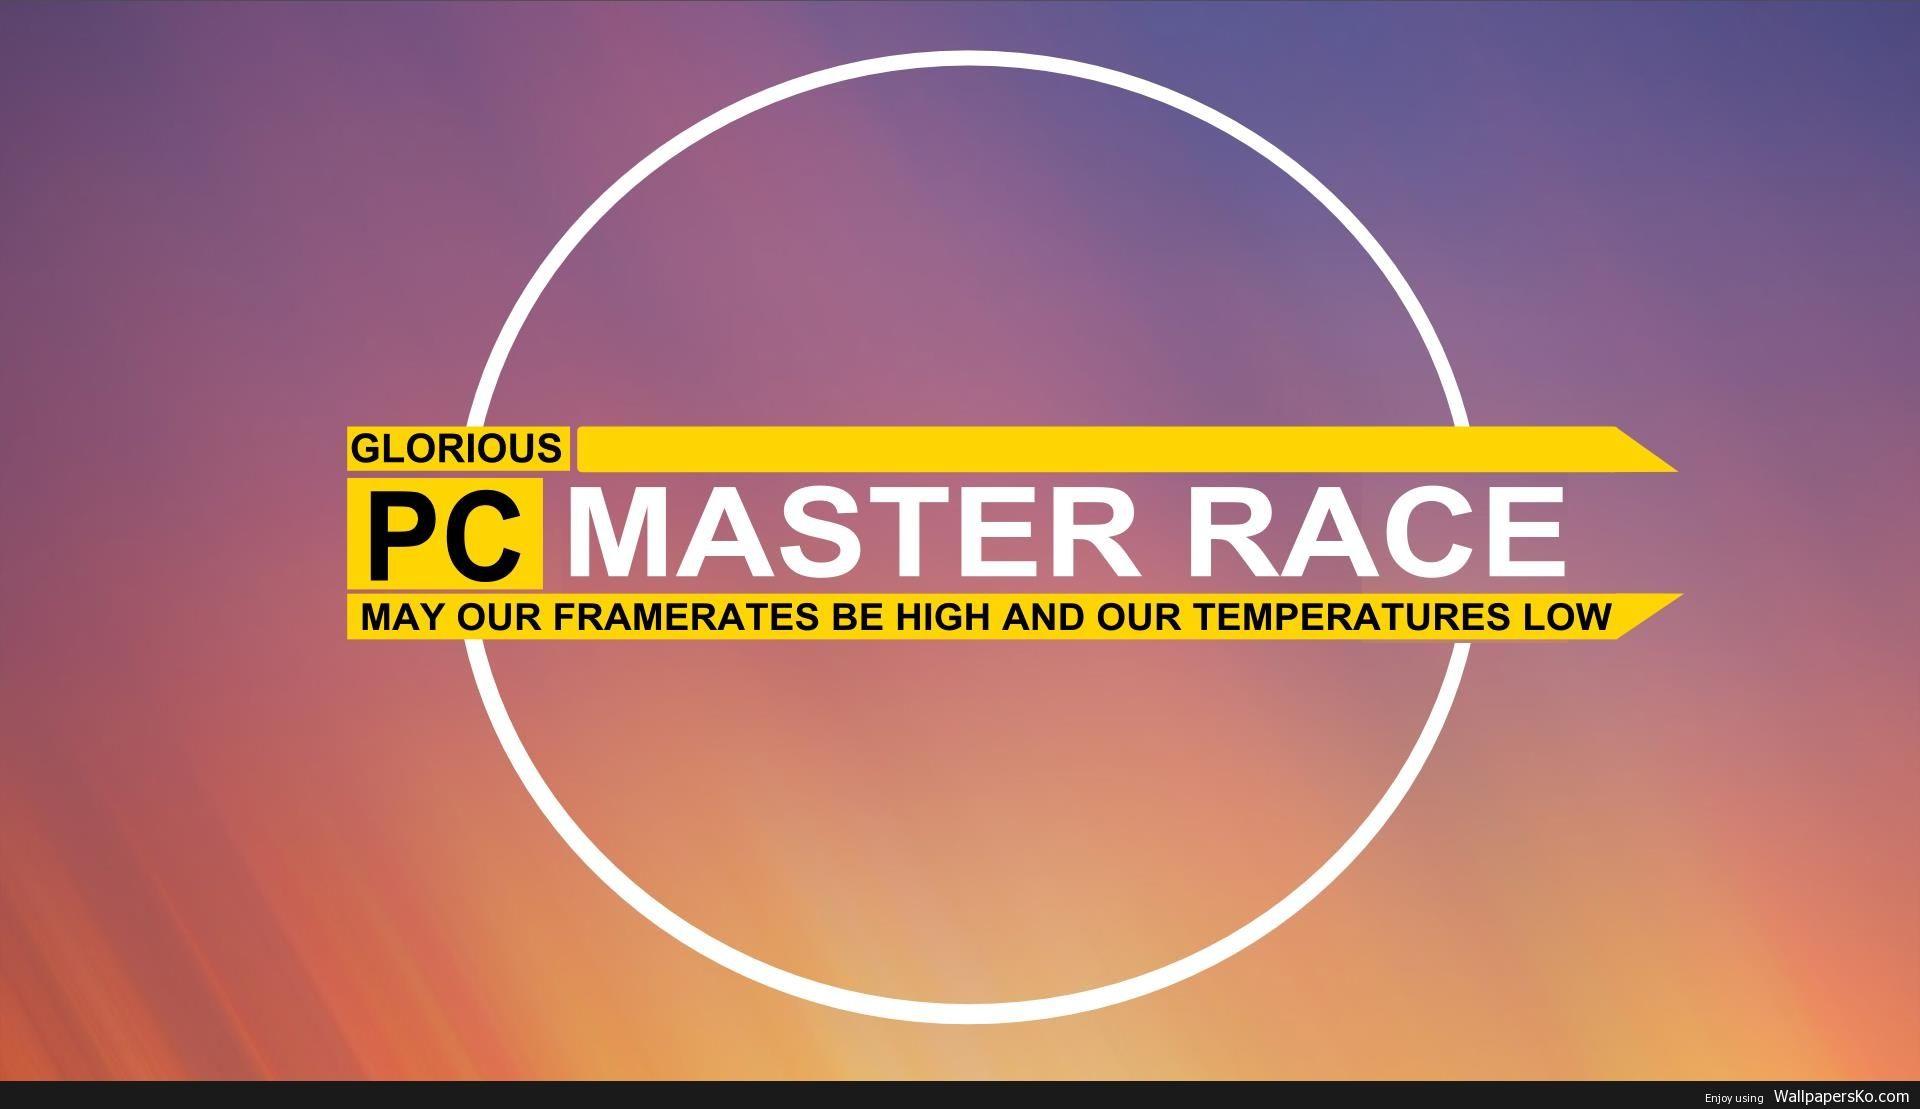 Pcmasterrace Wallpaper Http Wallpapersko Com Pcmasterrace